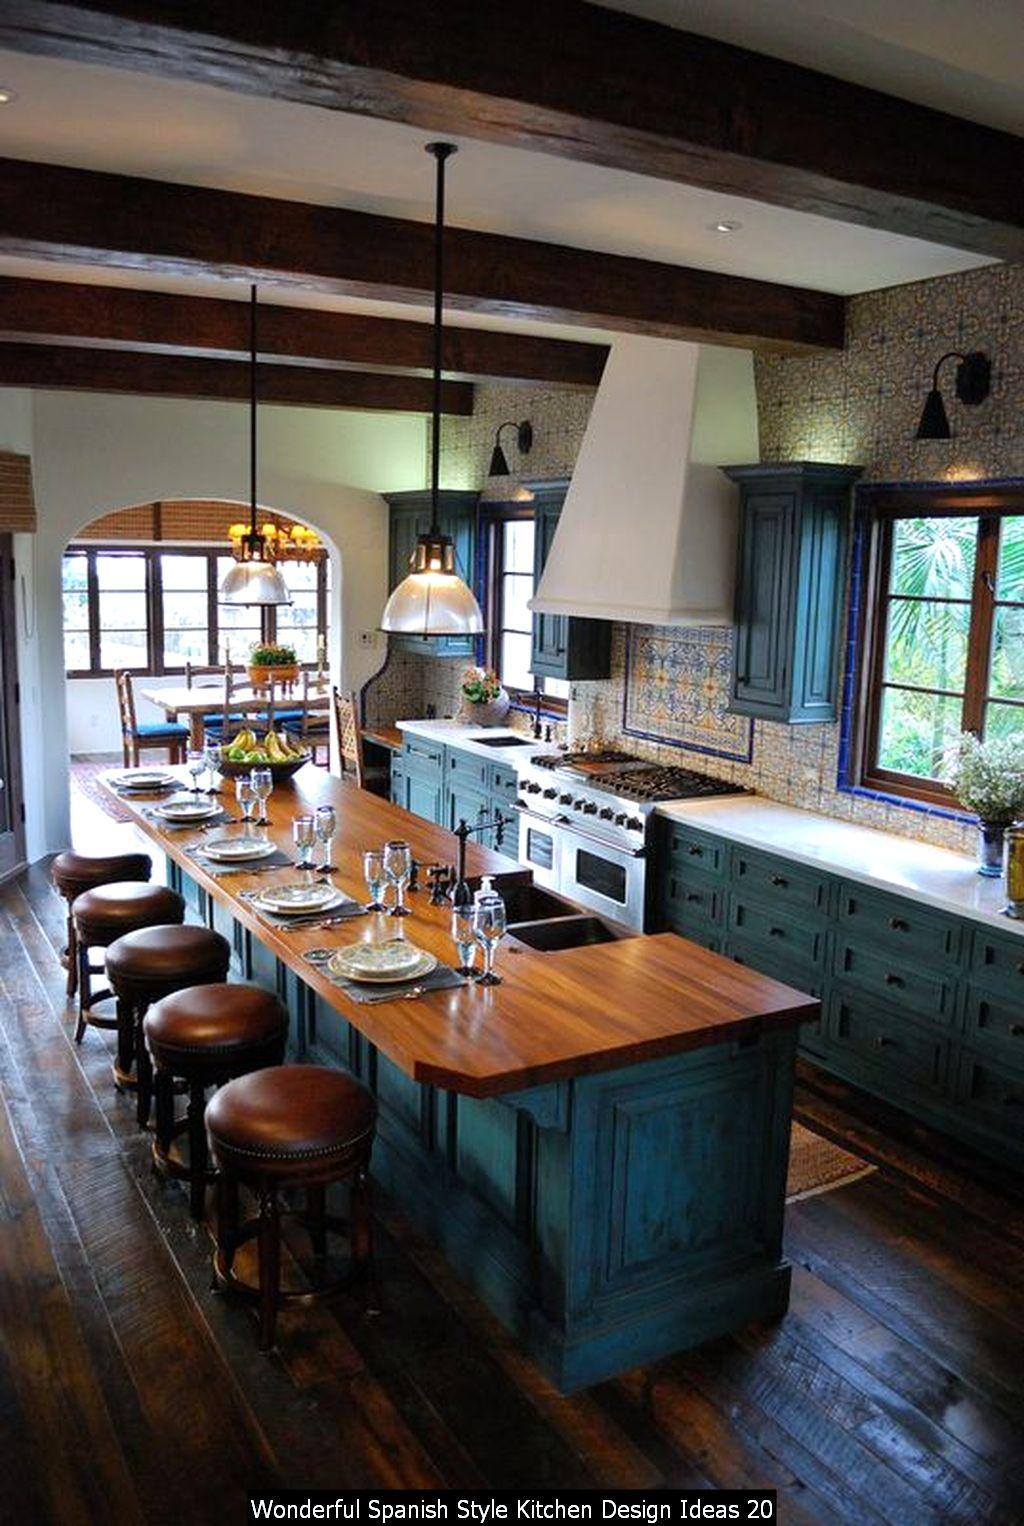 Wonderful Spanish Style Kitchen Design Ideas Mediterranean Kitchen Design Affordable Farmhouse Kitchen Interior Design Kitchen